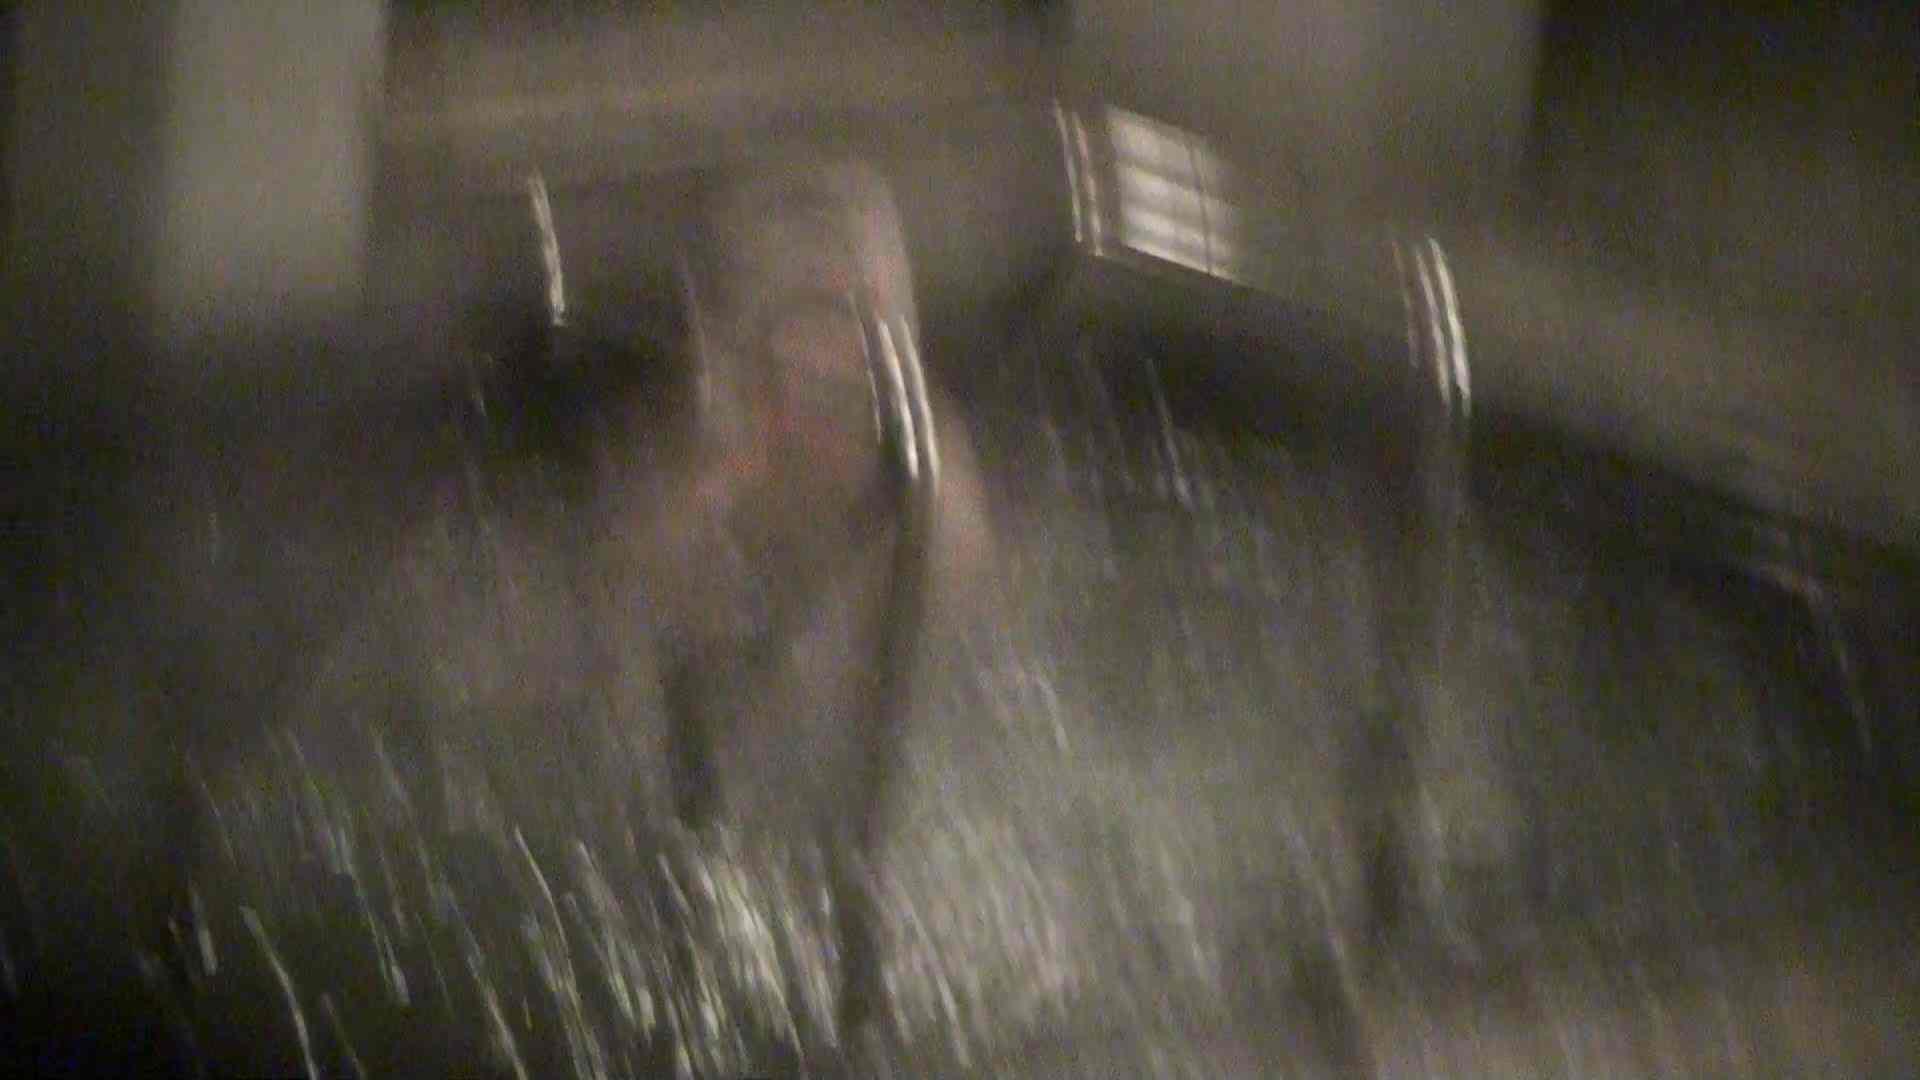 Aquaな露天風呂Vol.441 露天風呂突入 | 美しいOLの裸体  97pic 37